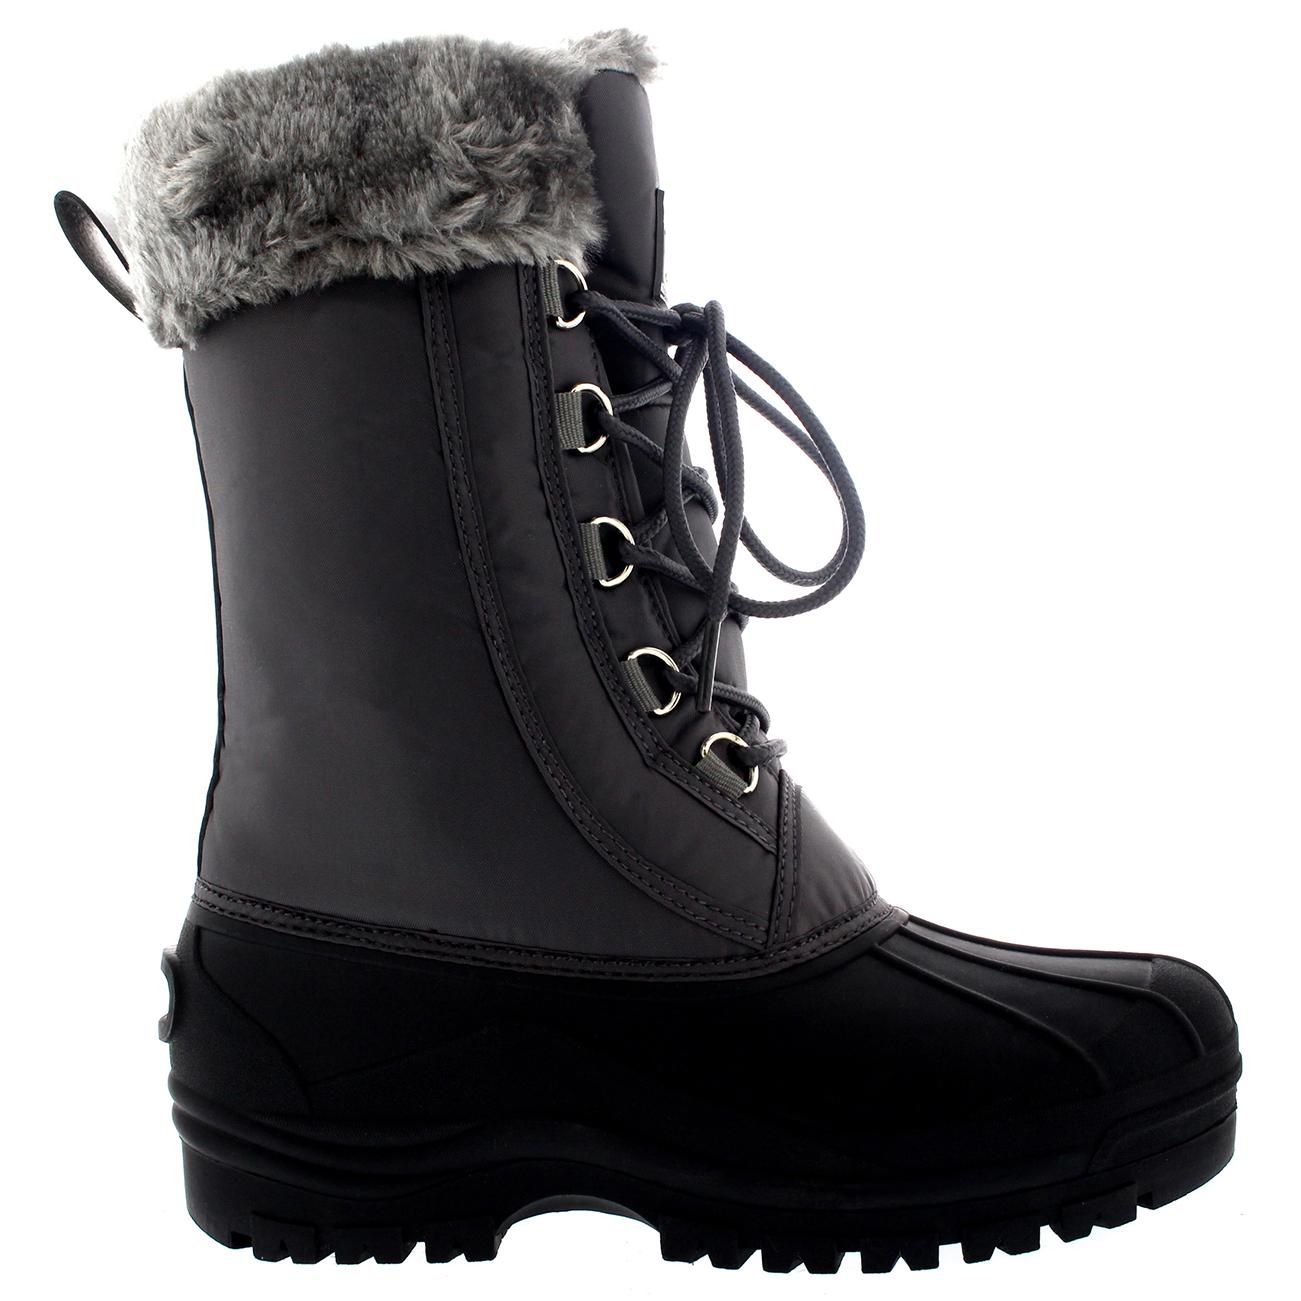 Womens Muck Fur Cuff Winter Walking Hiking Snow Waterproof